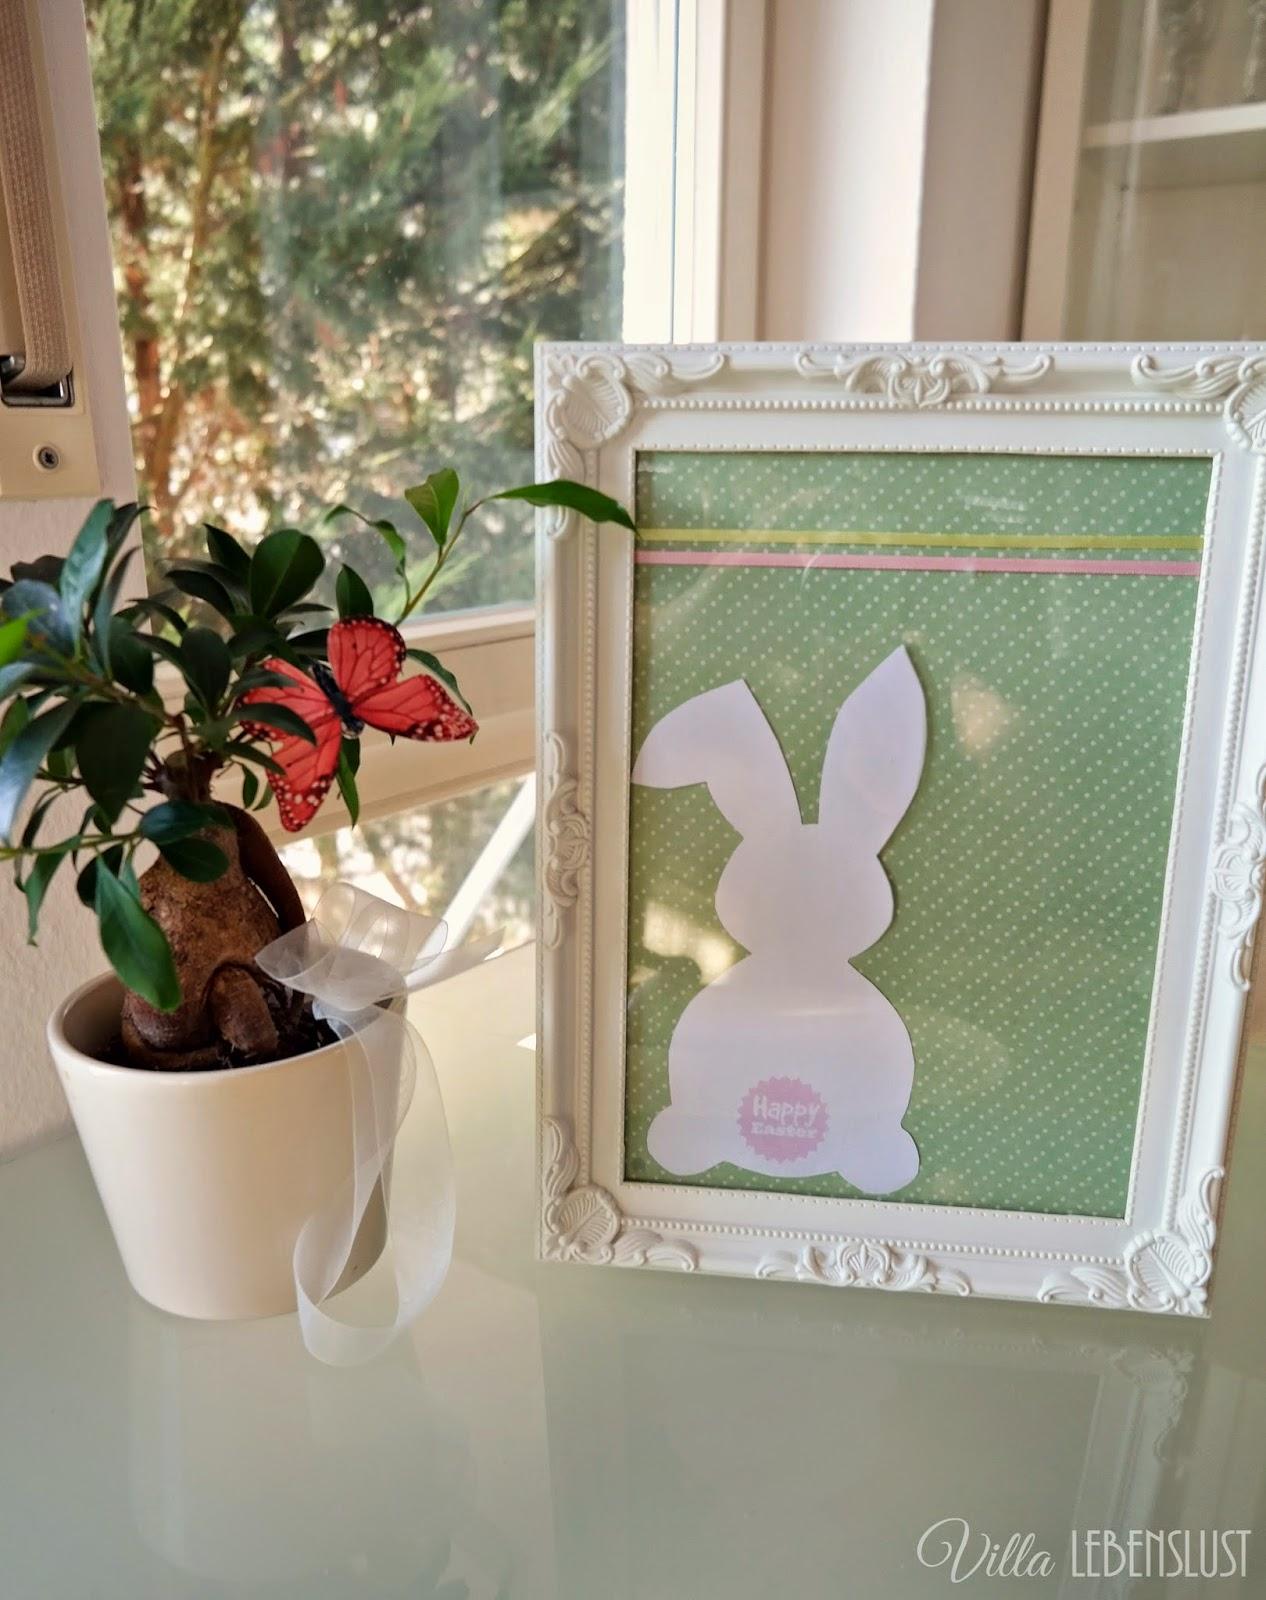 Villa Lebenslust Blog: DIY Osterhasenbild mit Happy Easter-Puschel